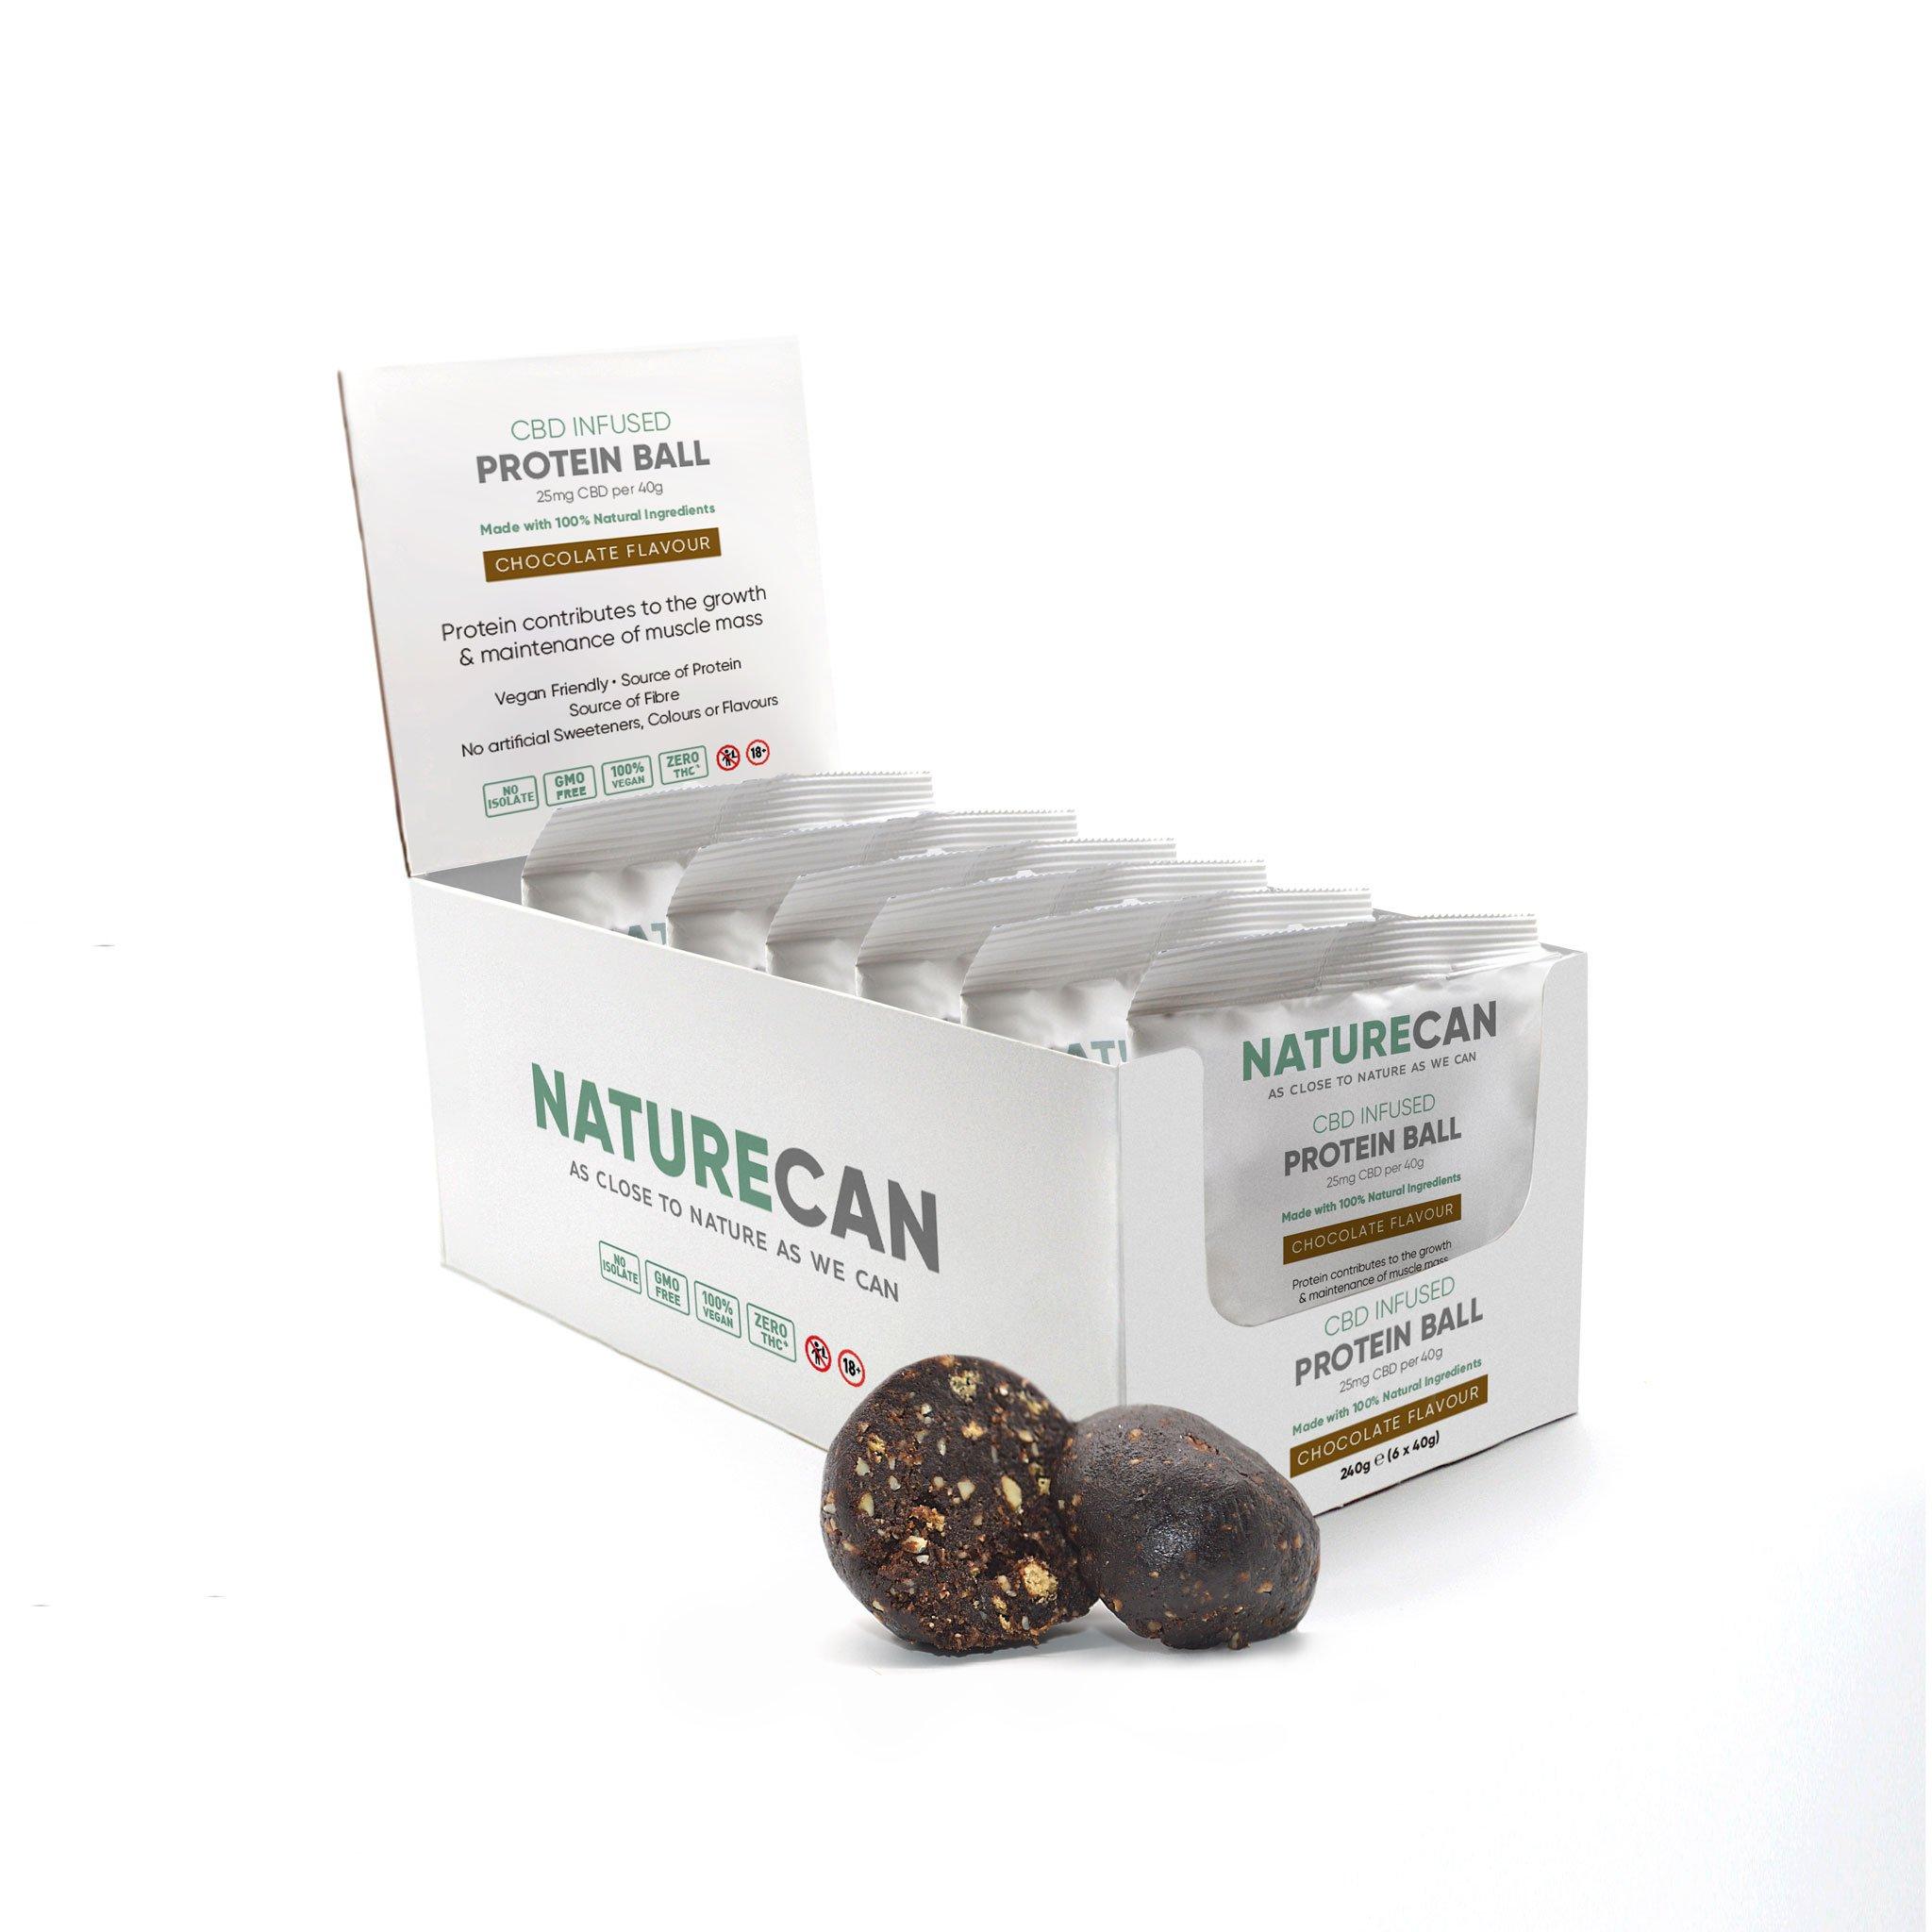 Protein Ball - Naturecan